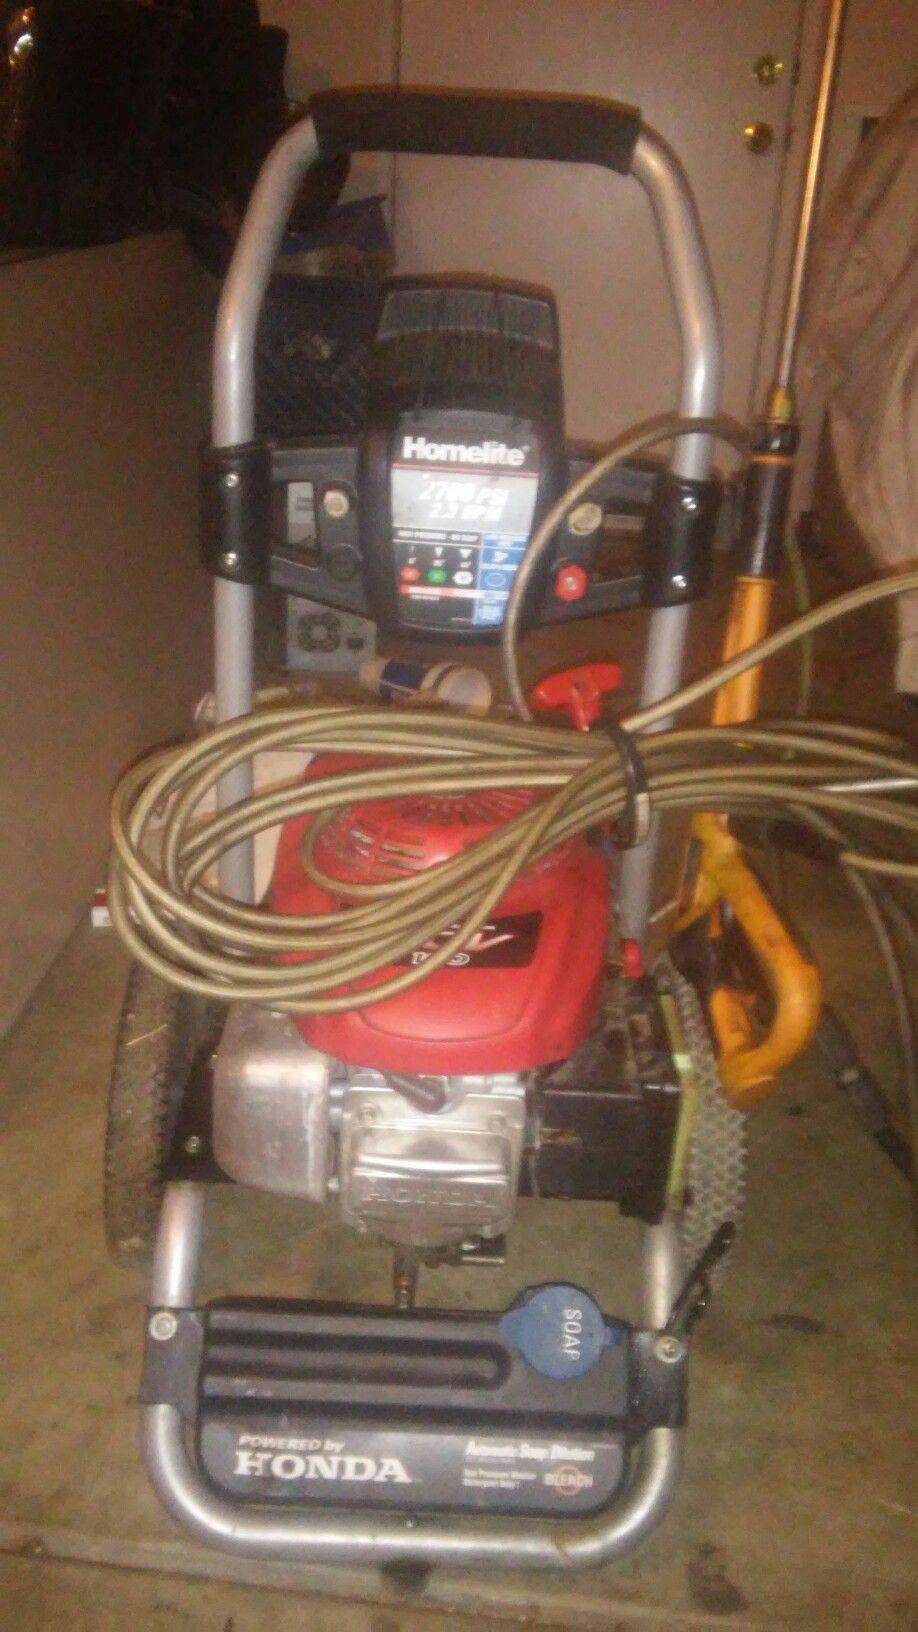 Pin On Homelite Honda Pressure Washer 2700 Psi 2 3 Gpm